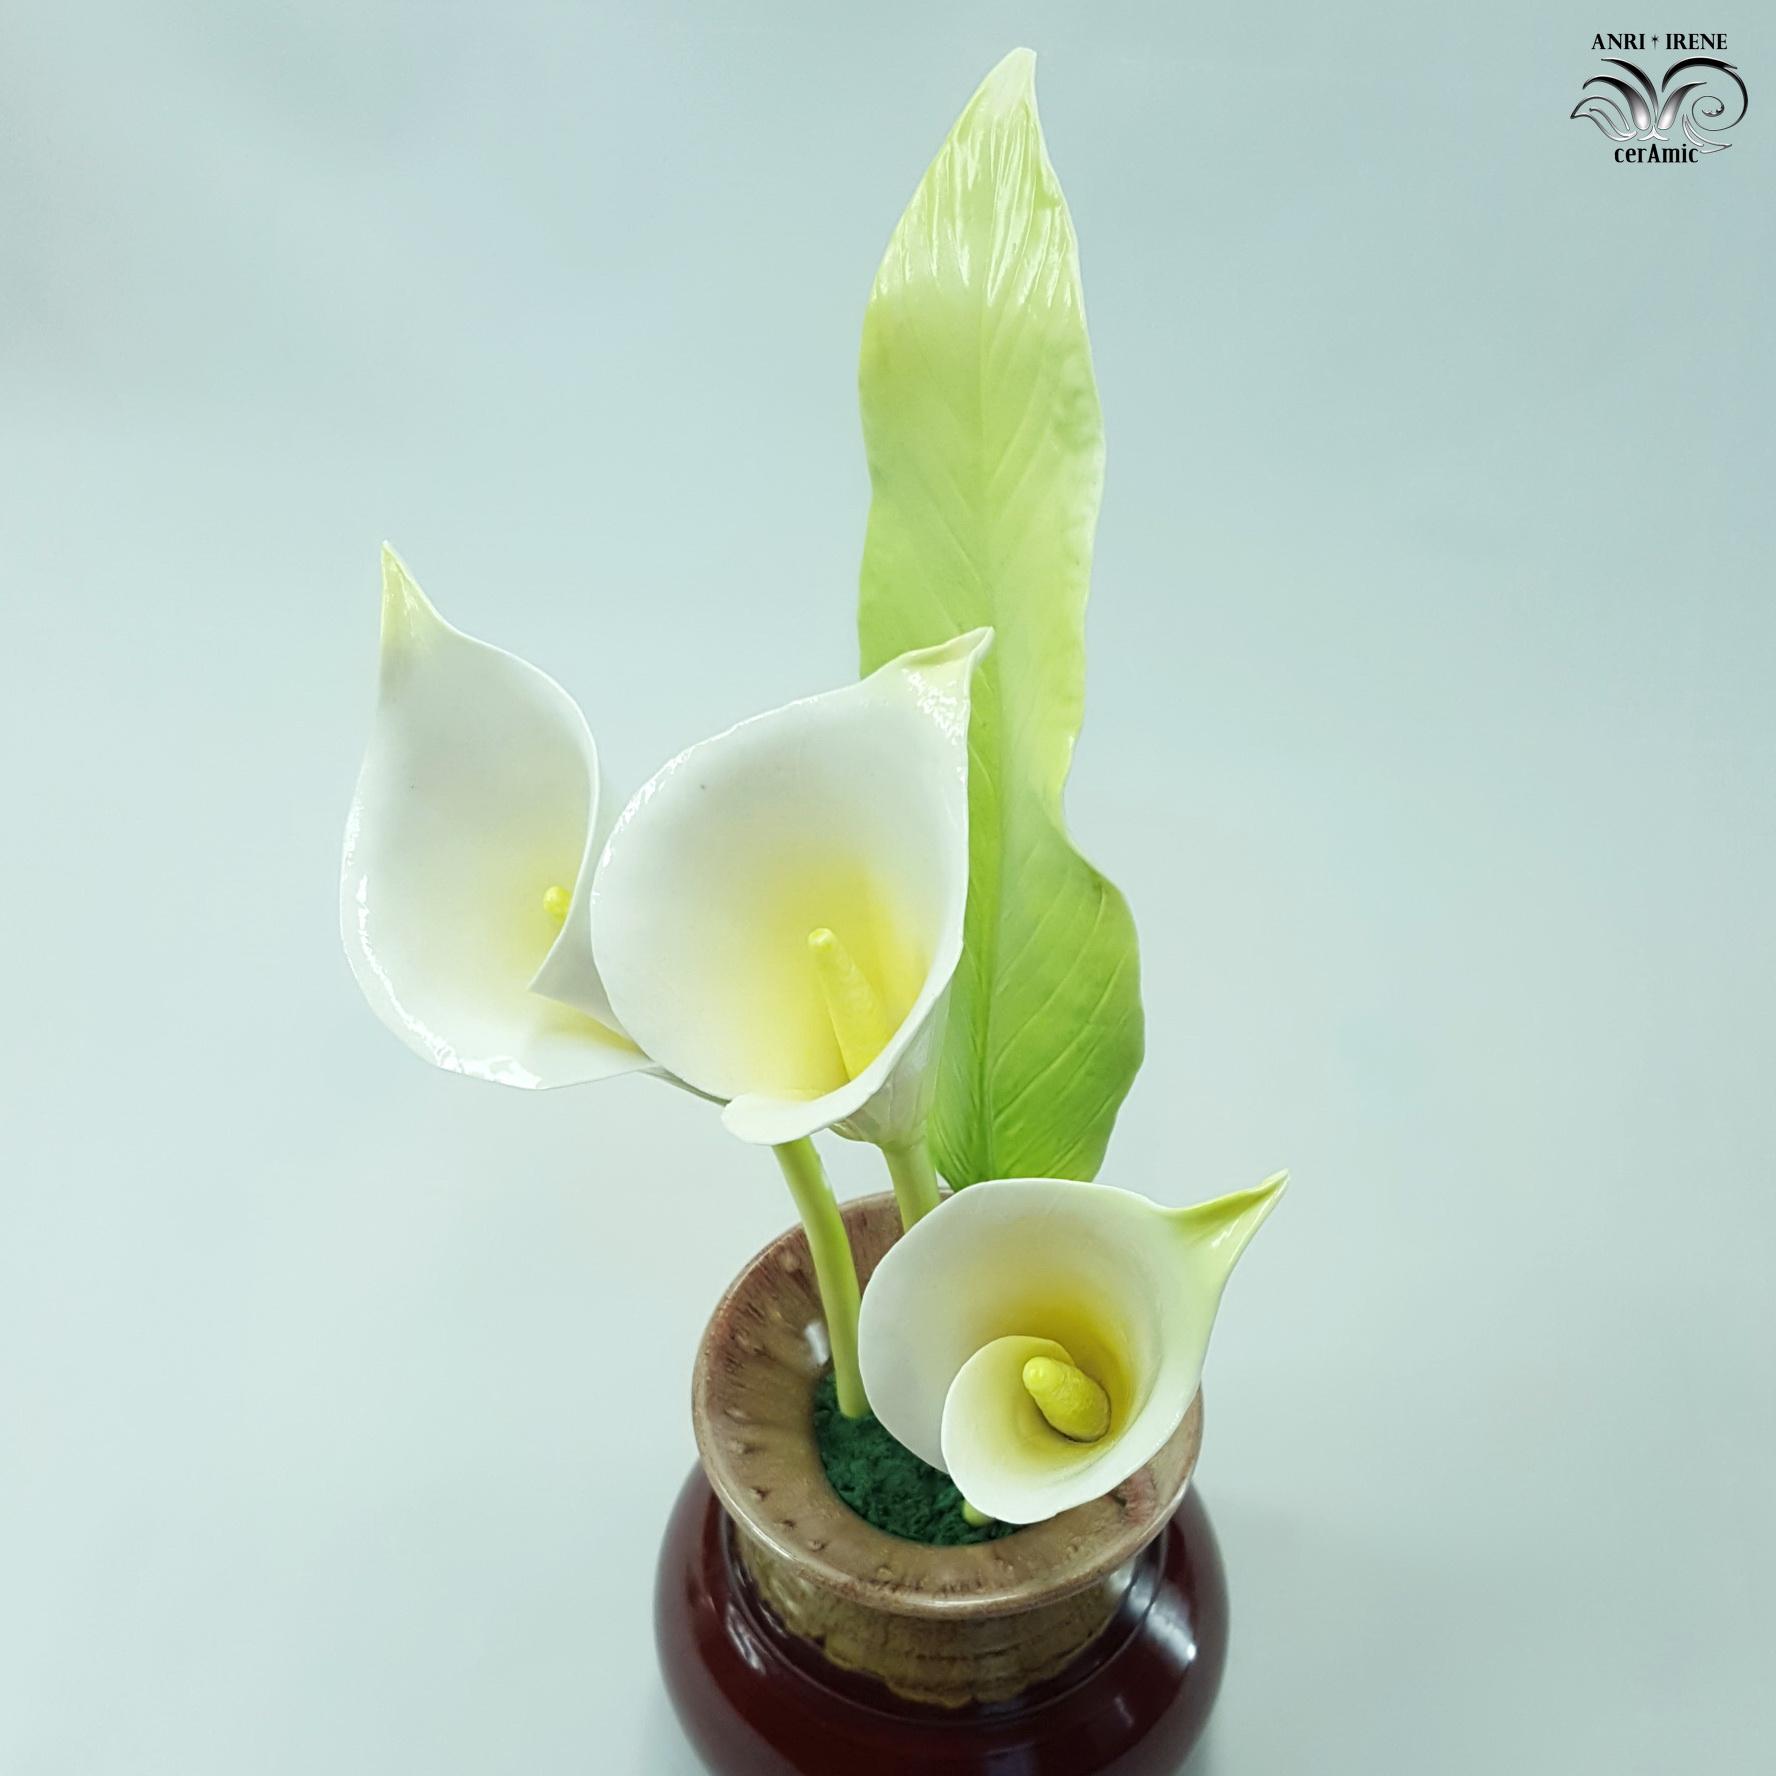 Porcelain lily calla